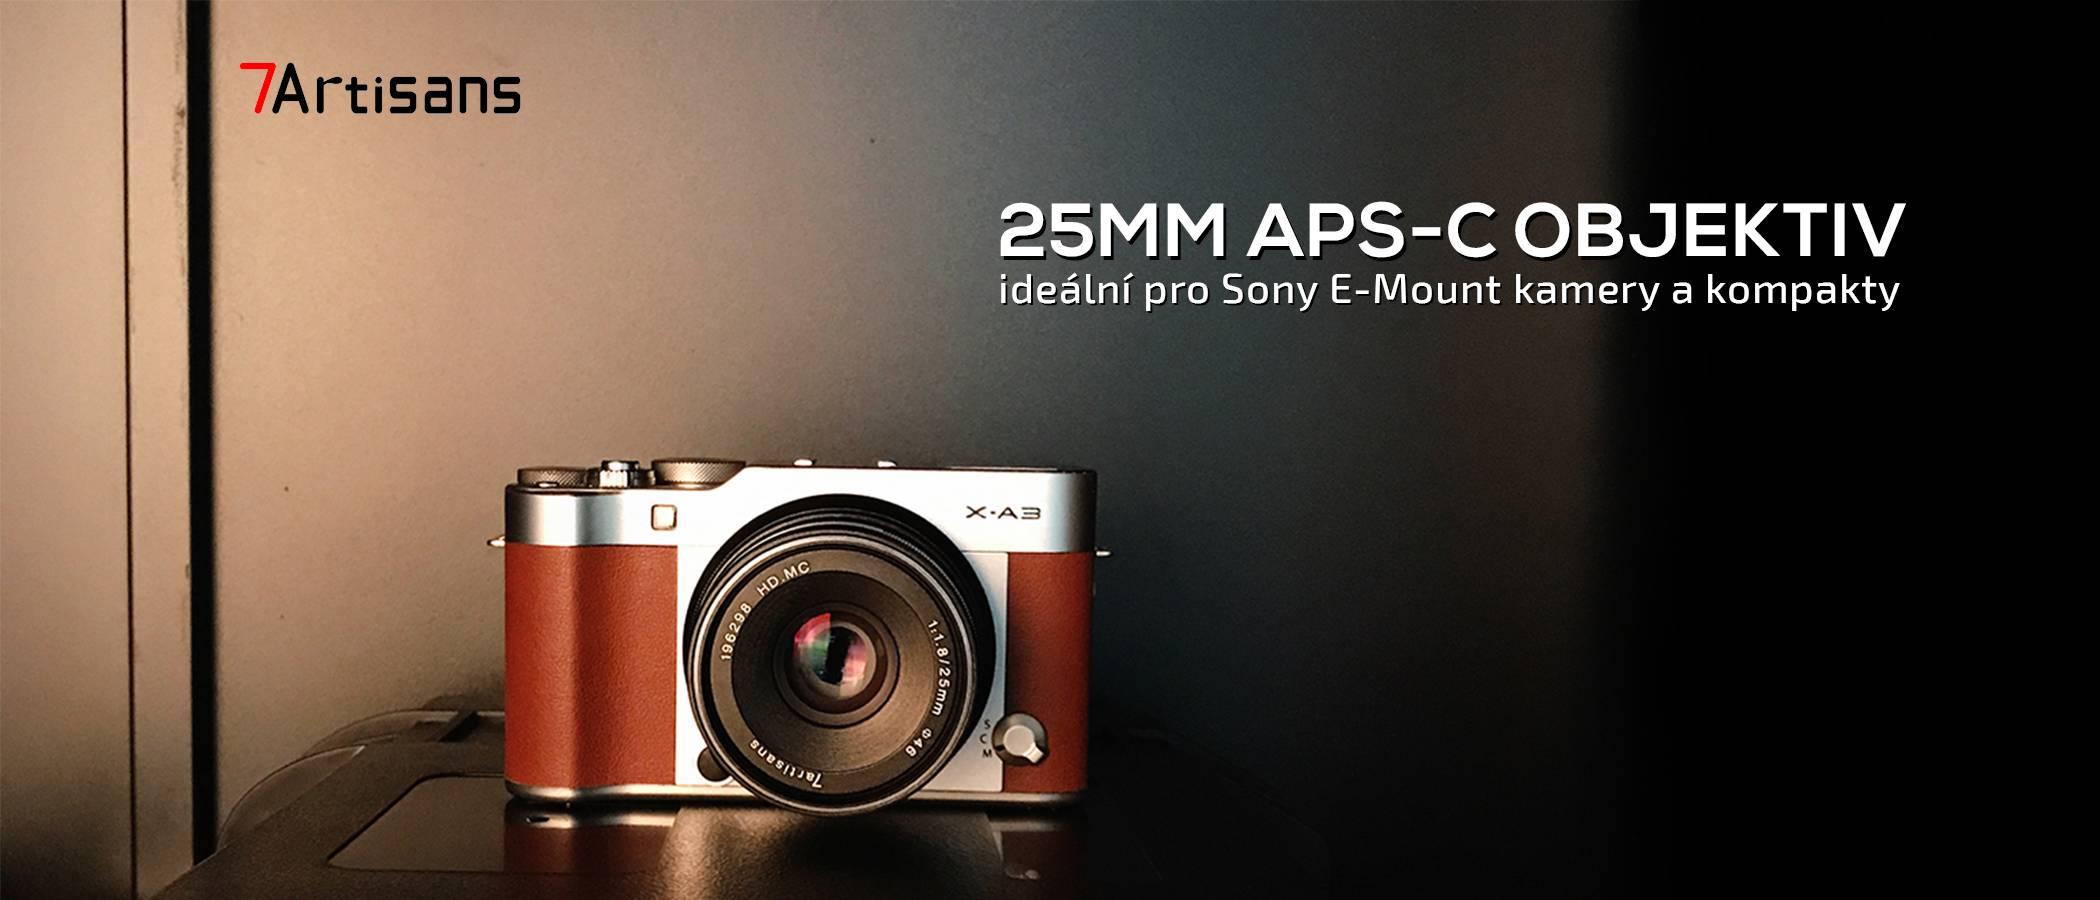 film-technika-7artisans-25-mm-aps-c-objektiv-sony-e